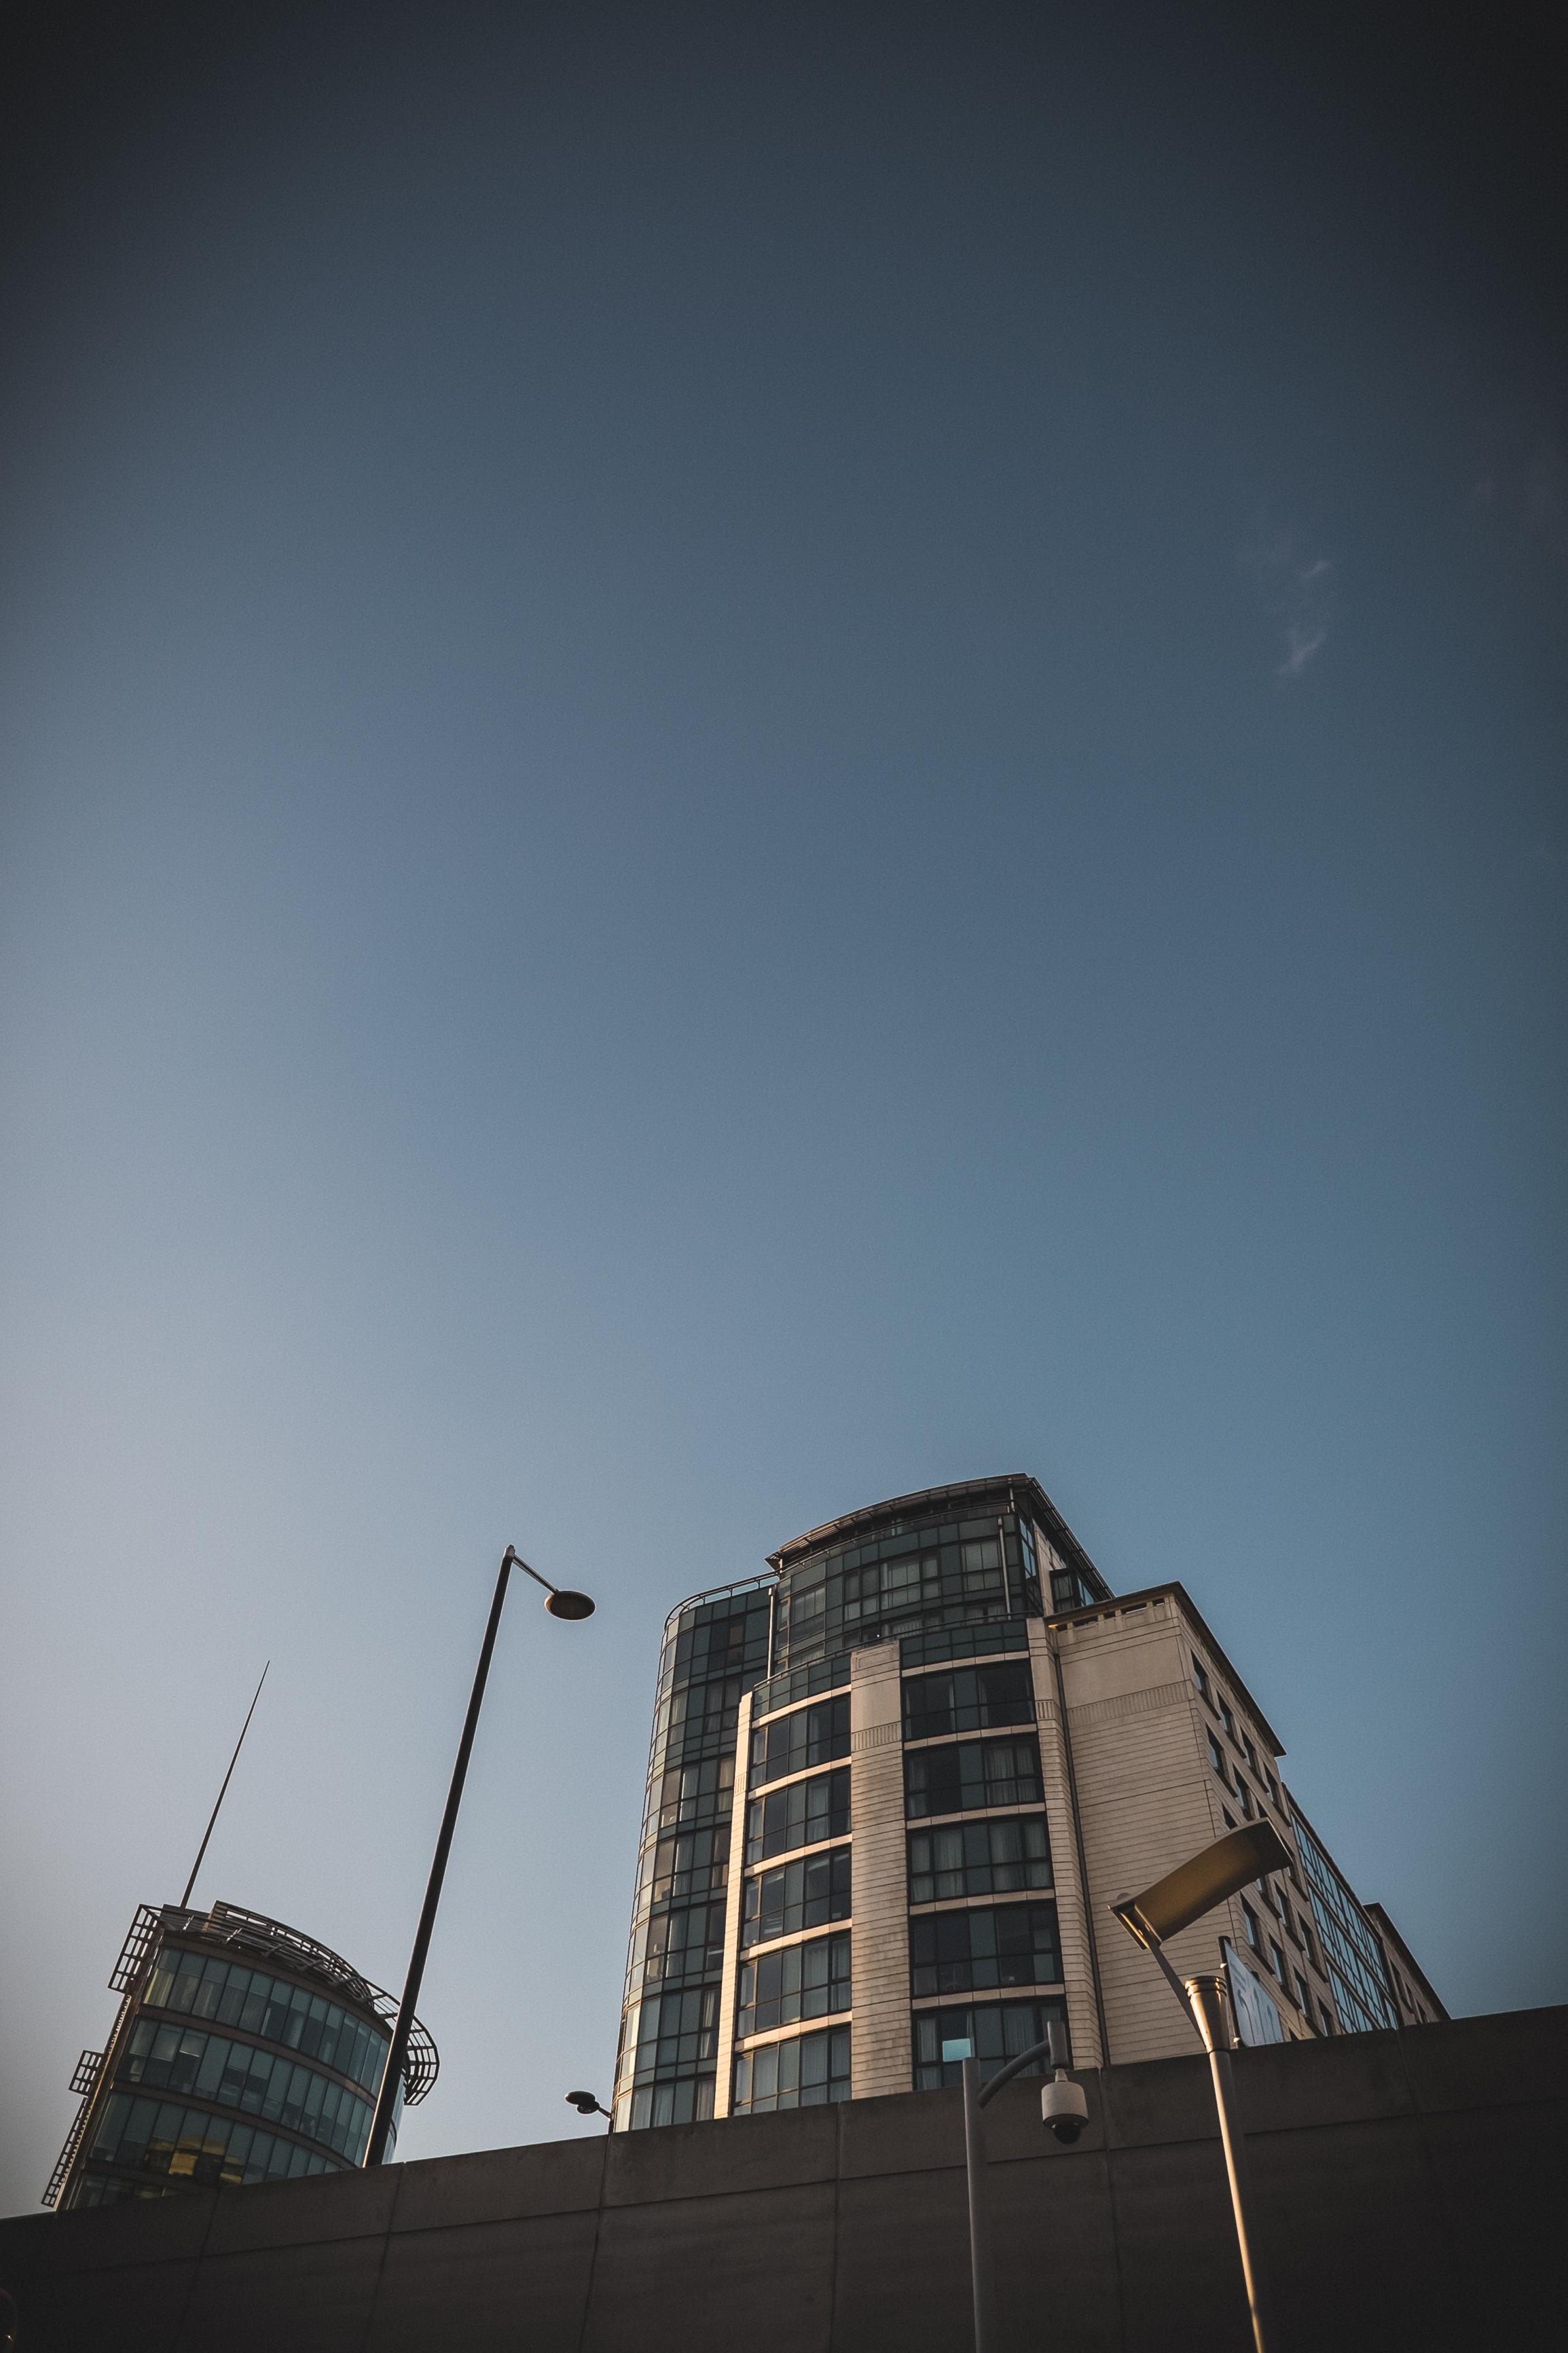 London Fuji Photowalk | Fuji XE2 | 14mm - F2.8 - 1/1100th - iso800